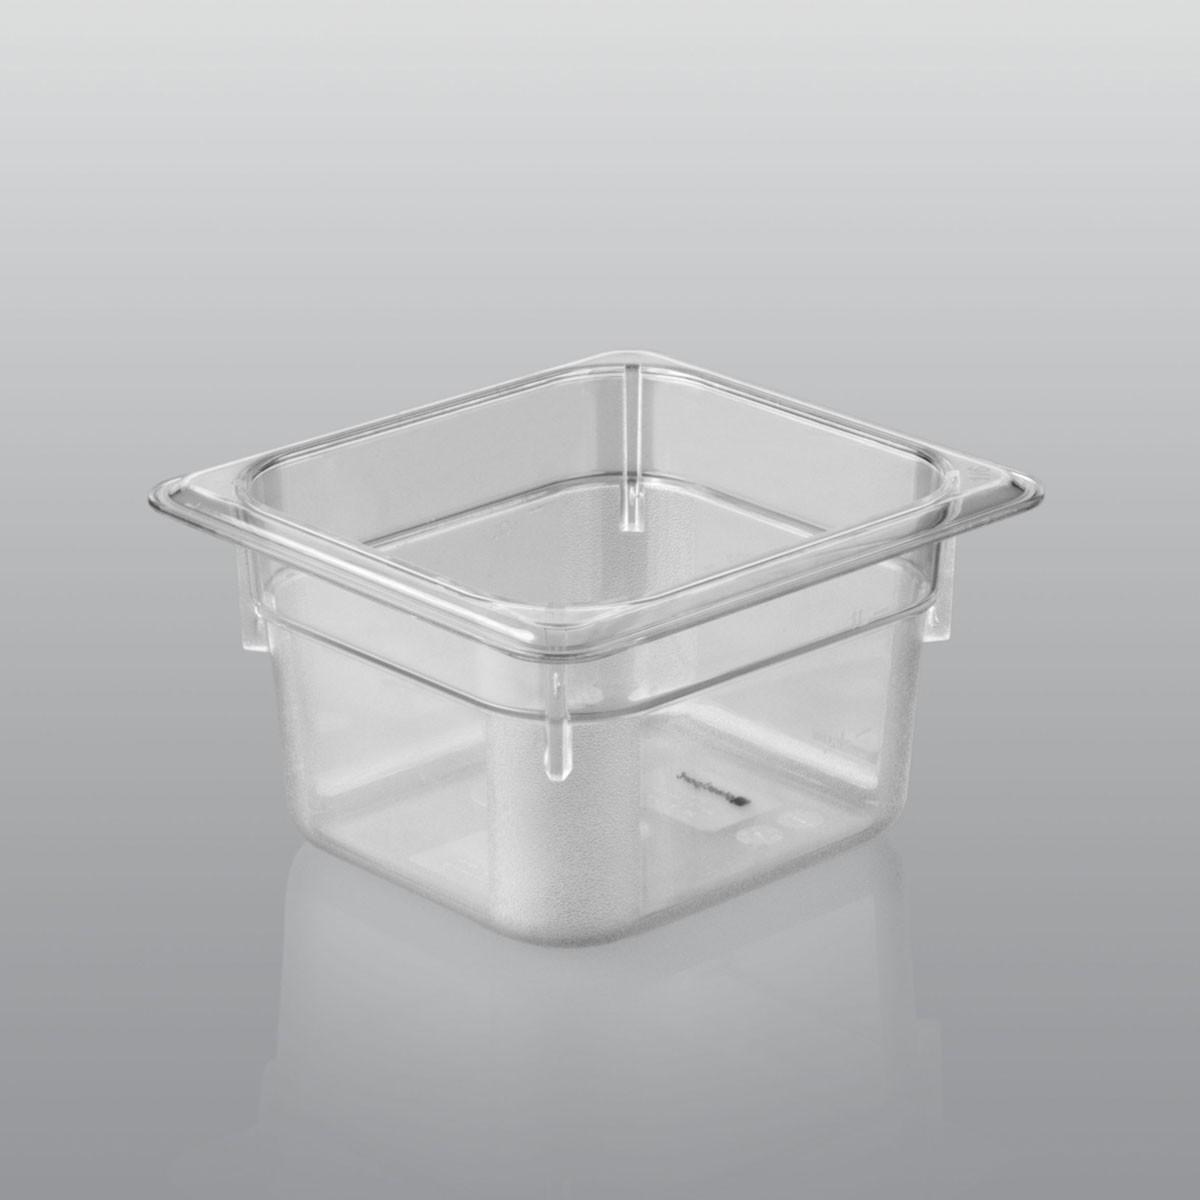 GN-Behälter GN 1/6 aus Polycarbonat (Tiefe: 65mm) 1,0 L Saro